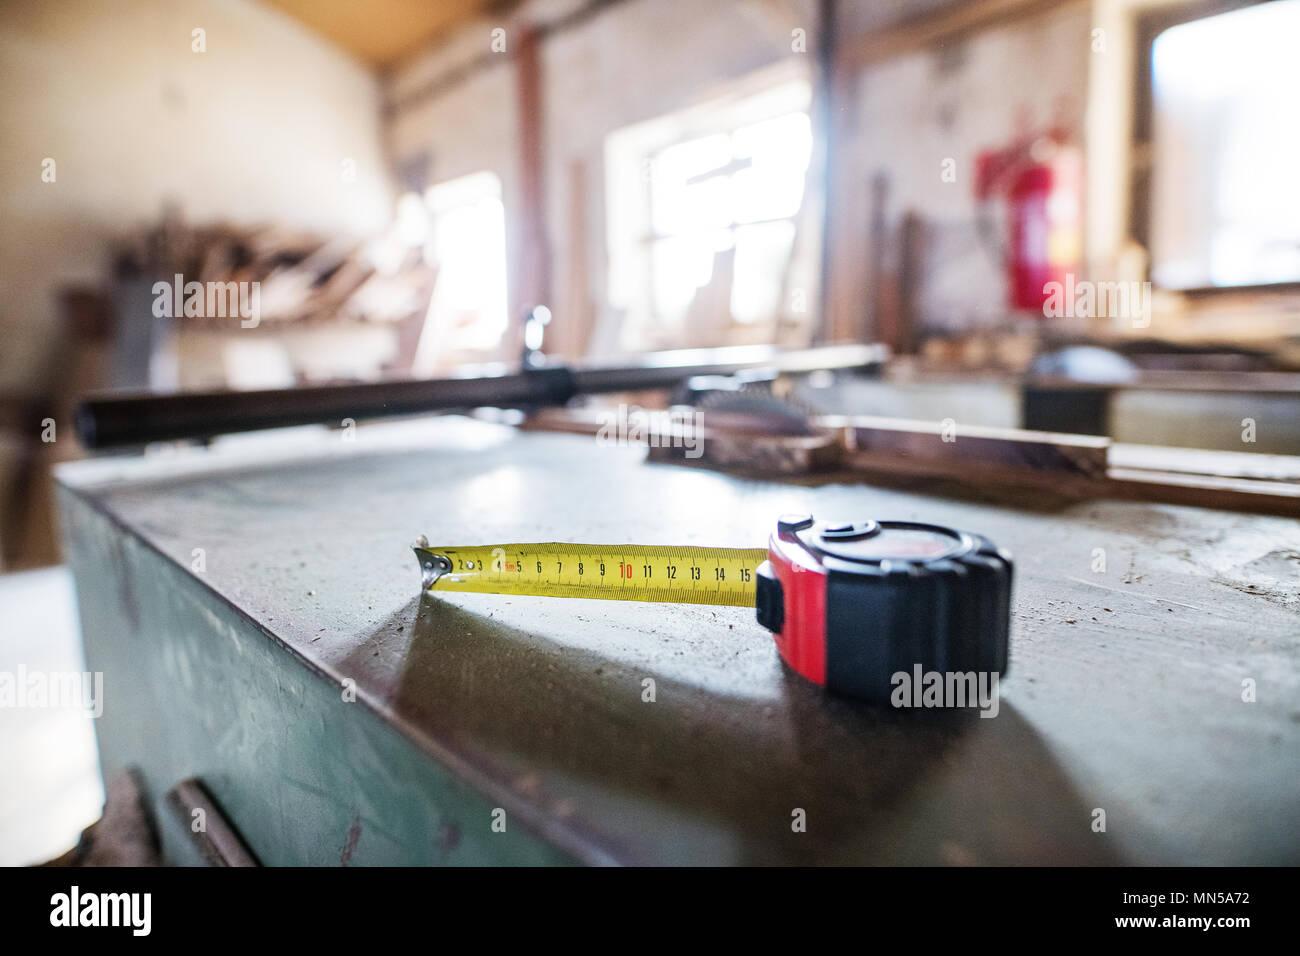 Aflexible ruler in carpentry workshop. Blurred background. - Stock Image